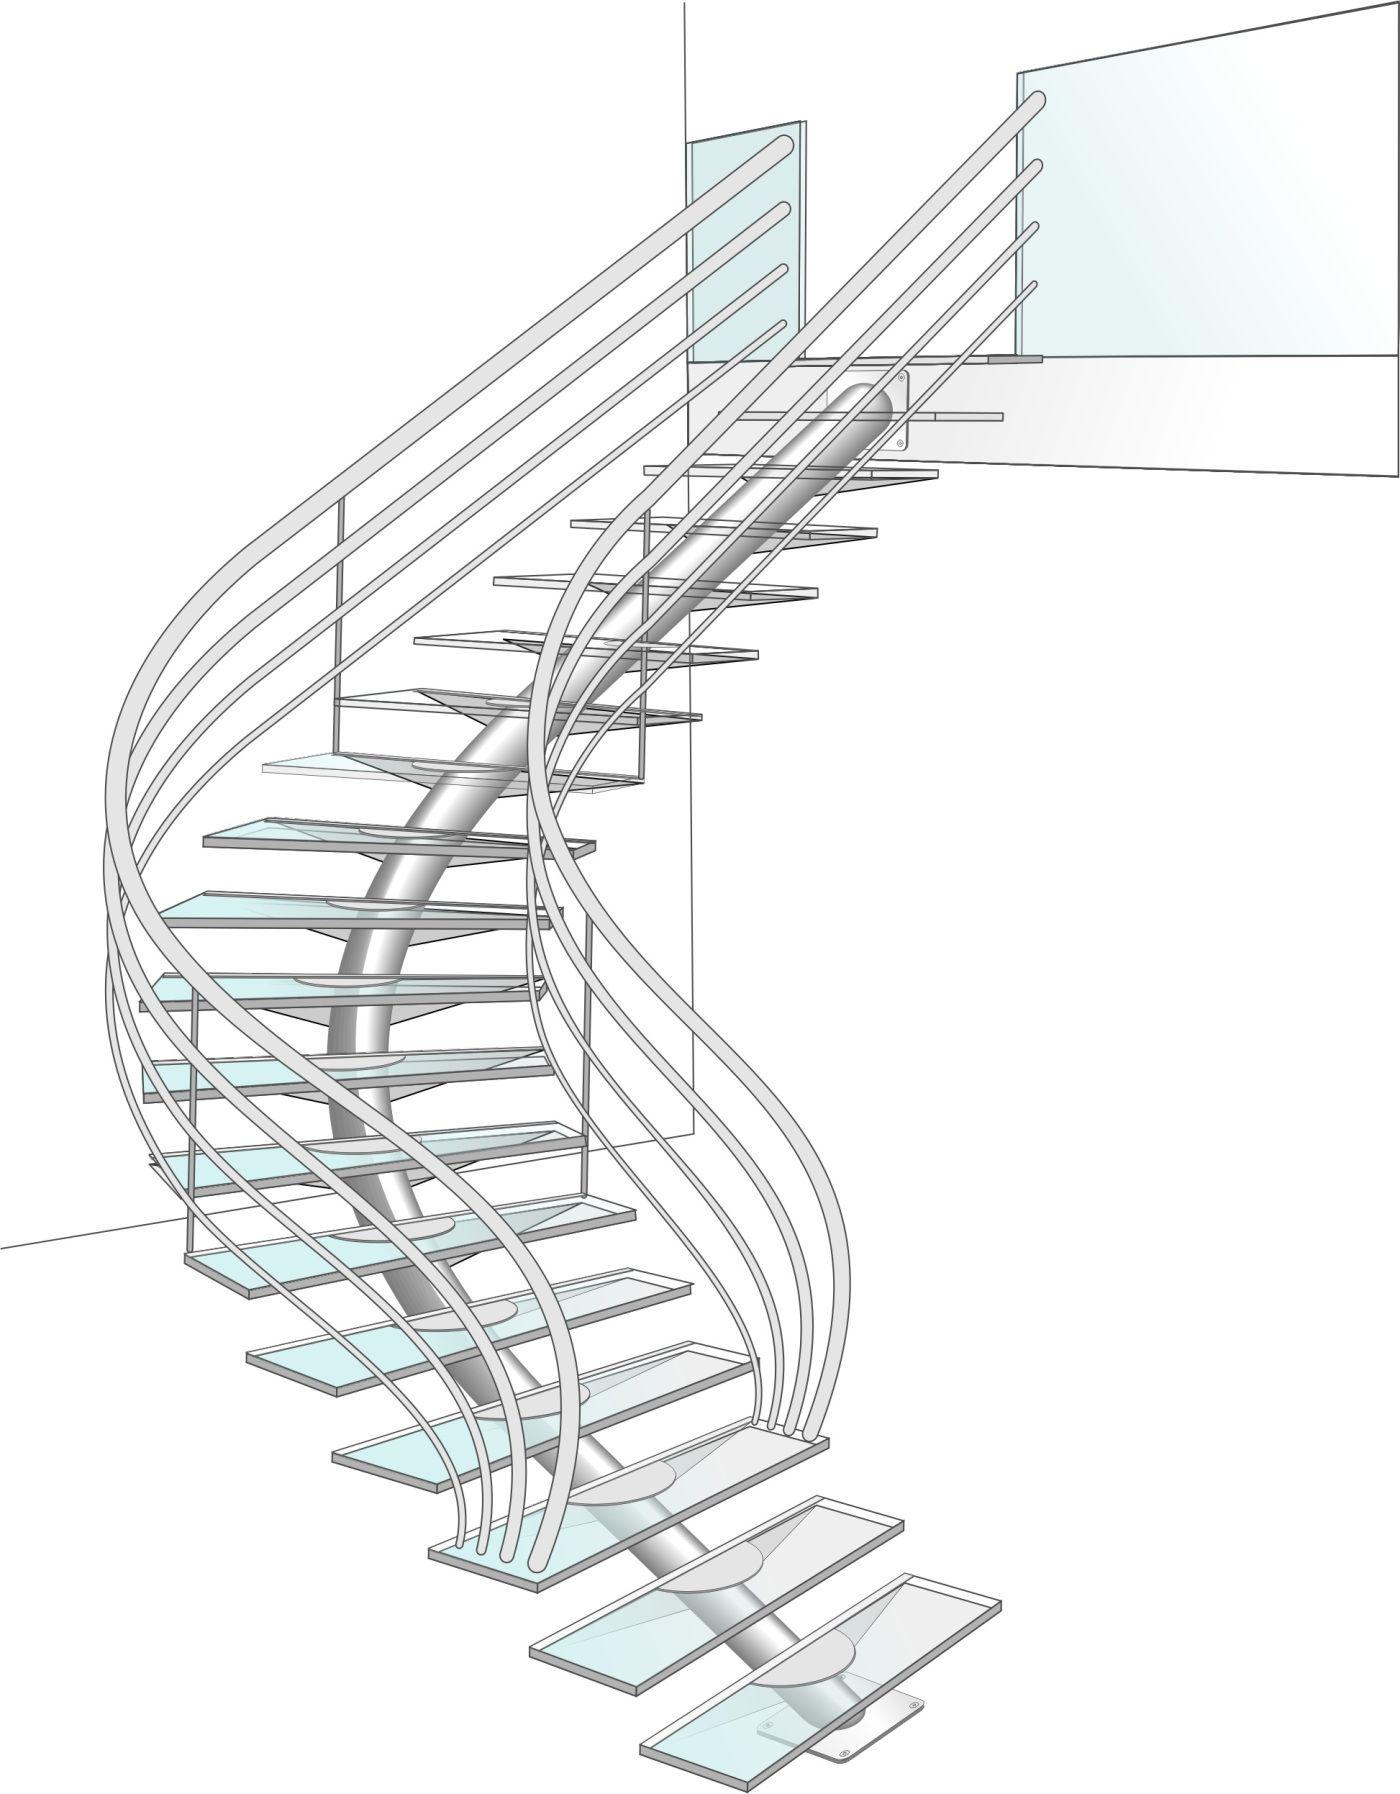 dessin tude escalier design m tal et verre escaliers pinterest escalier design tude et. Black Bedroom Furniture Sets. Home Design Ideas